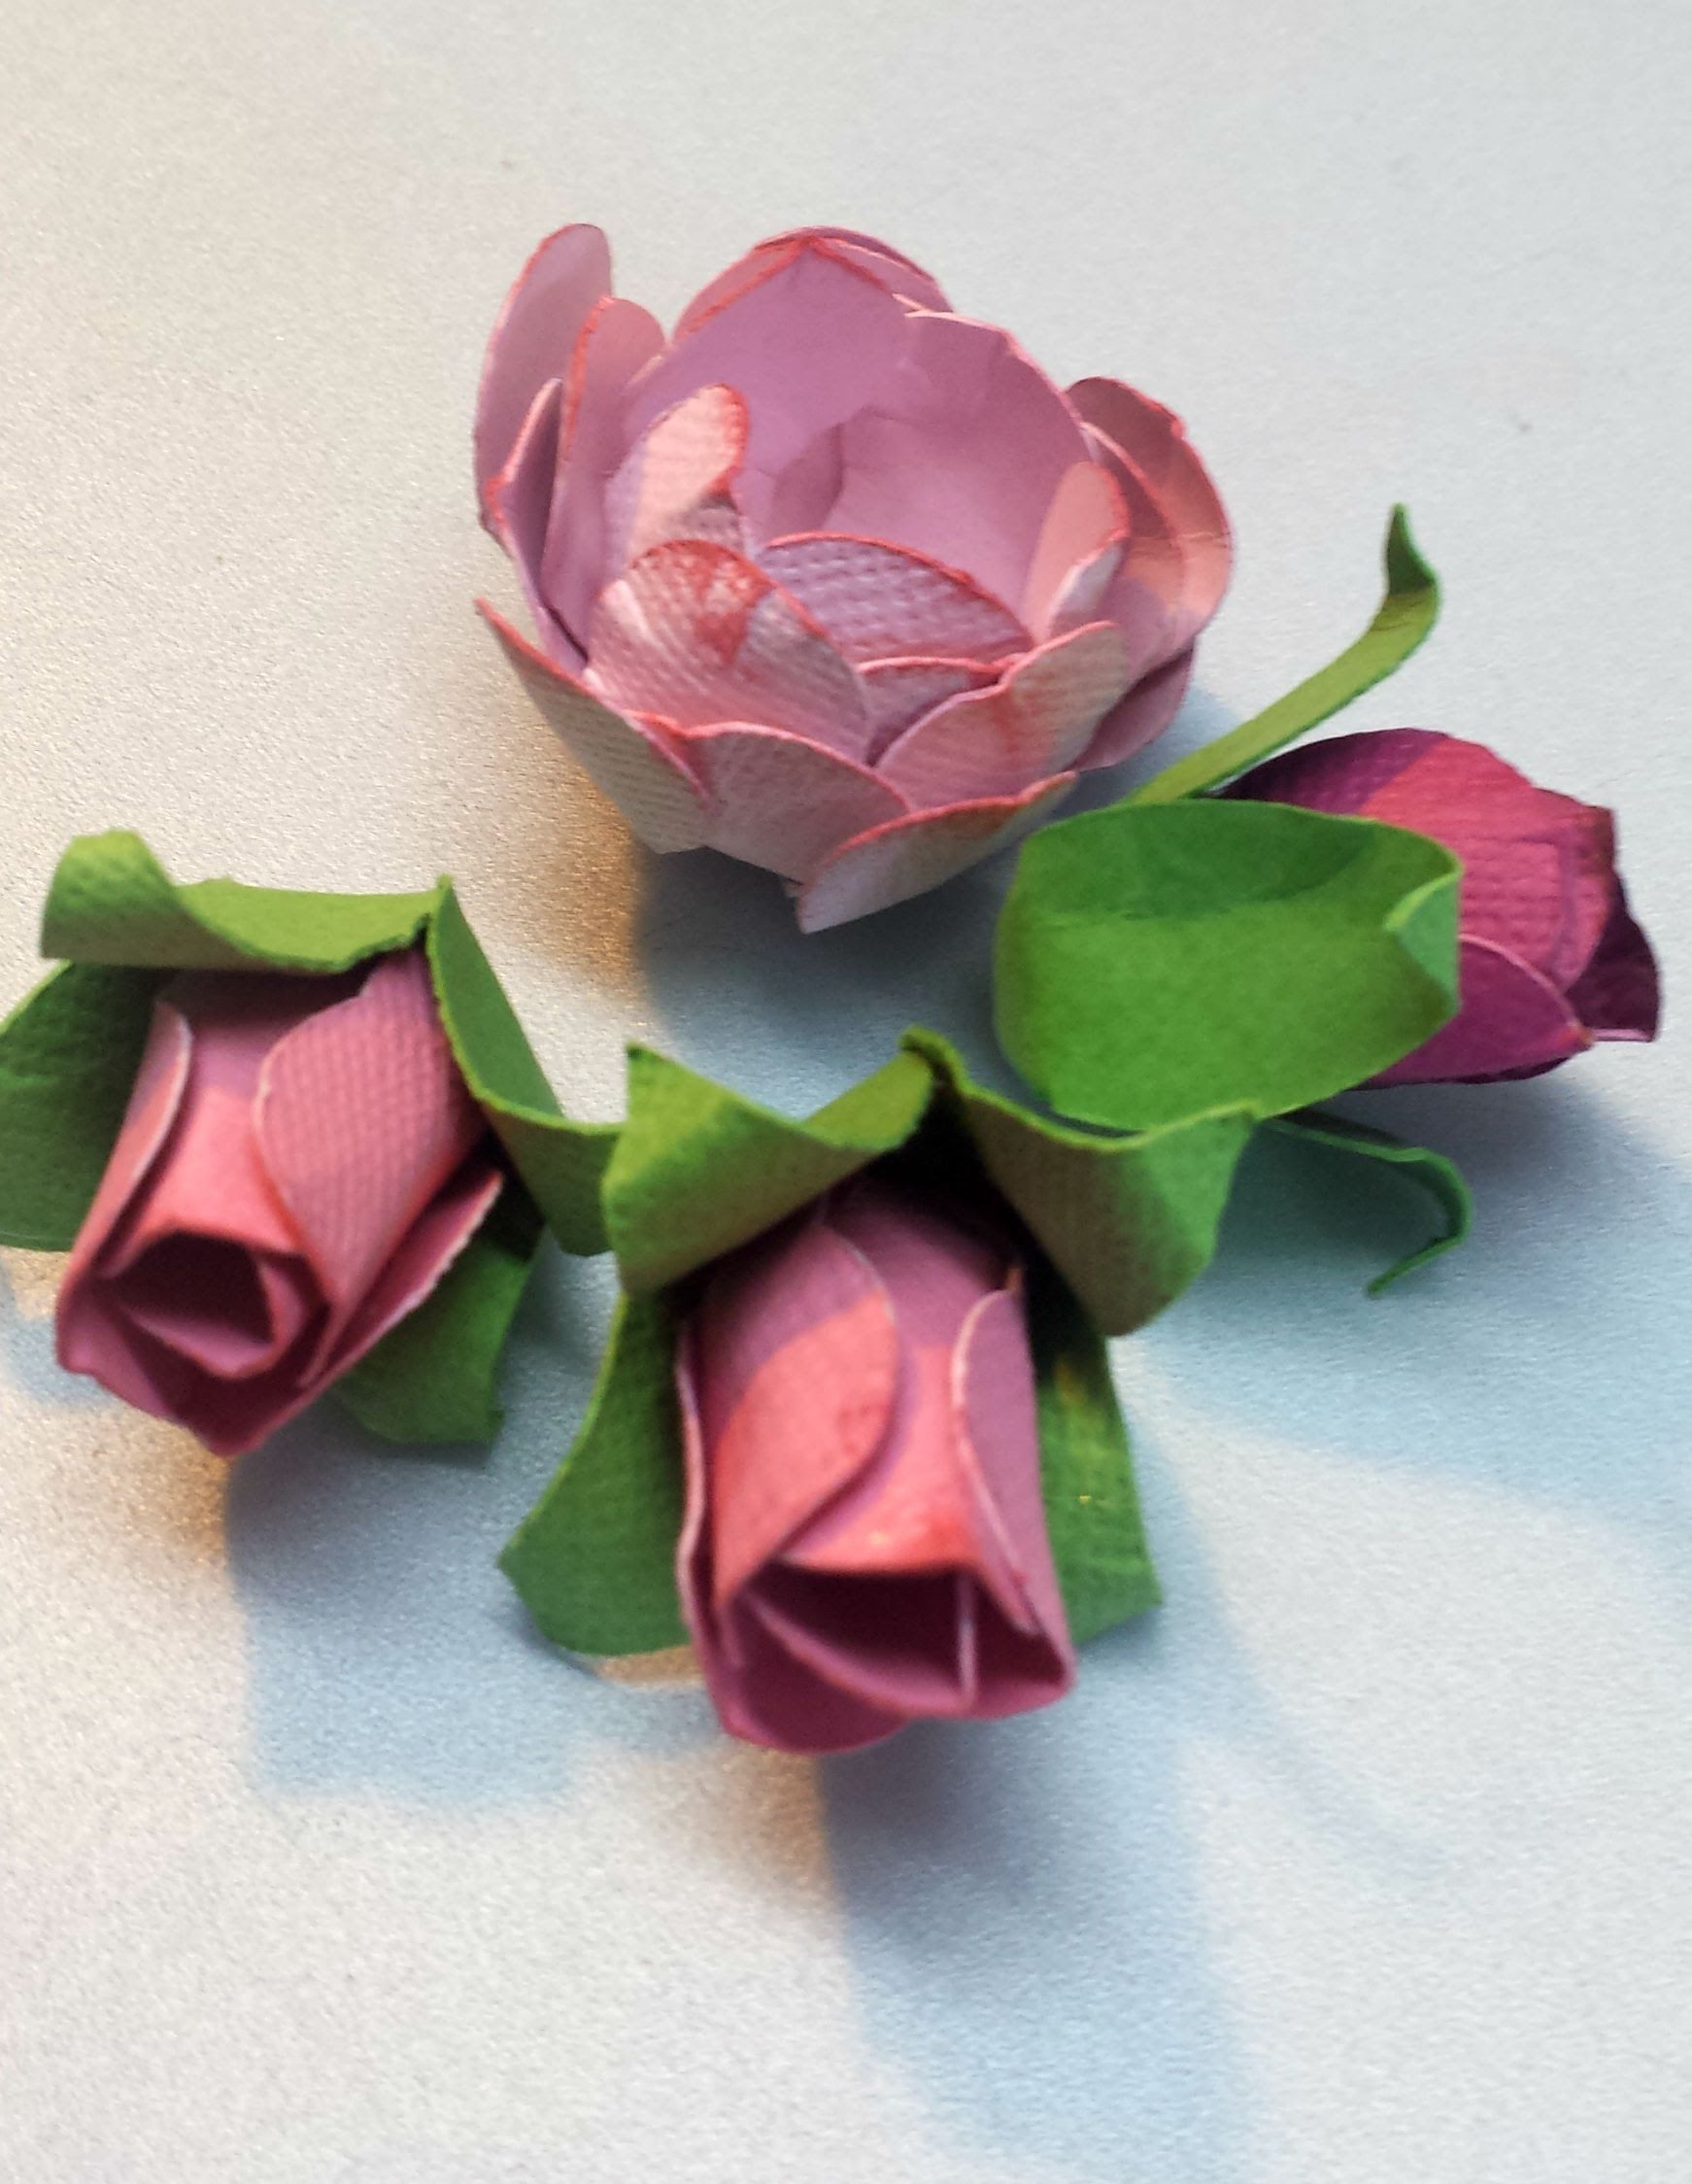 Rose bud tutorial paper flowers makinflowers pinterest rose rose bud tutorial paper flowers mightylinksfo Choice Image